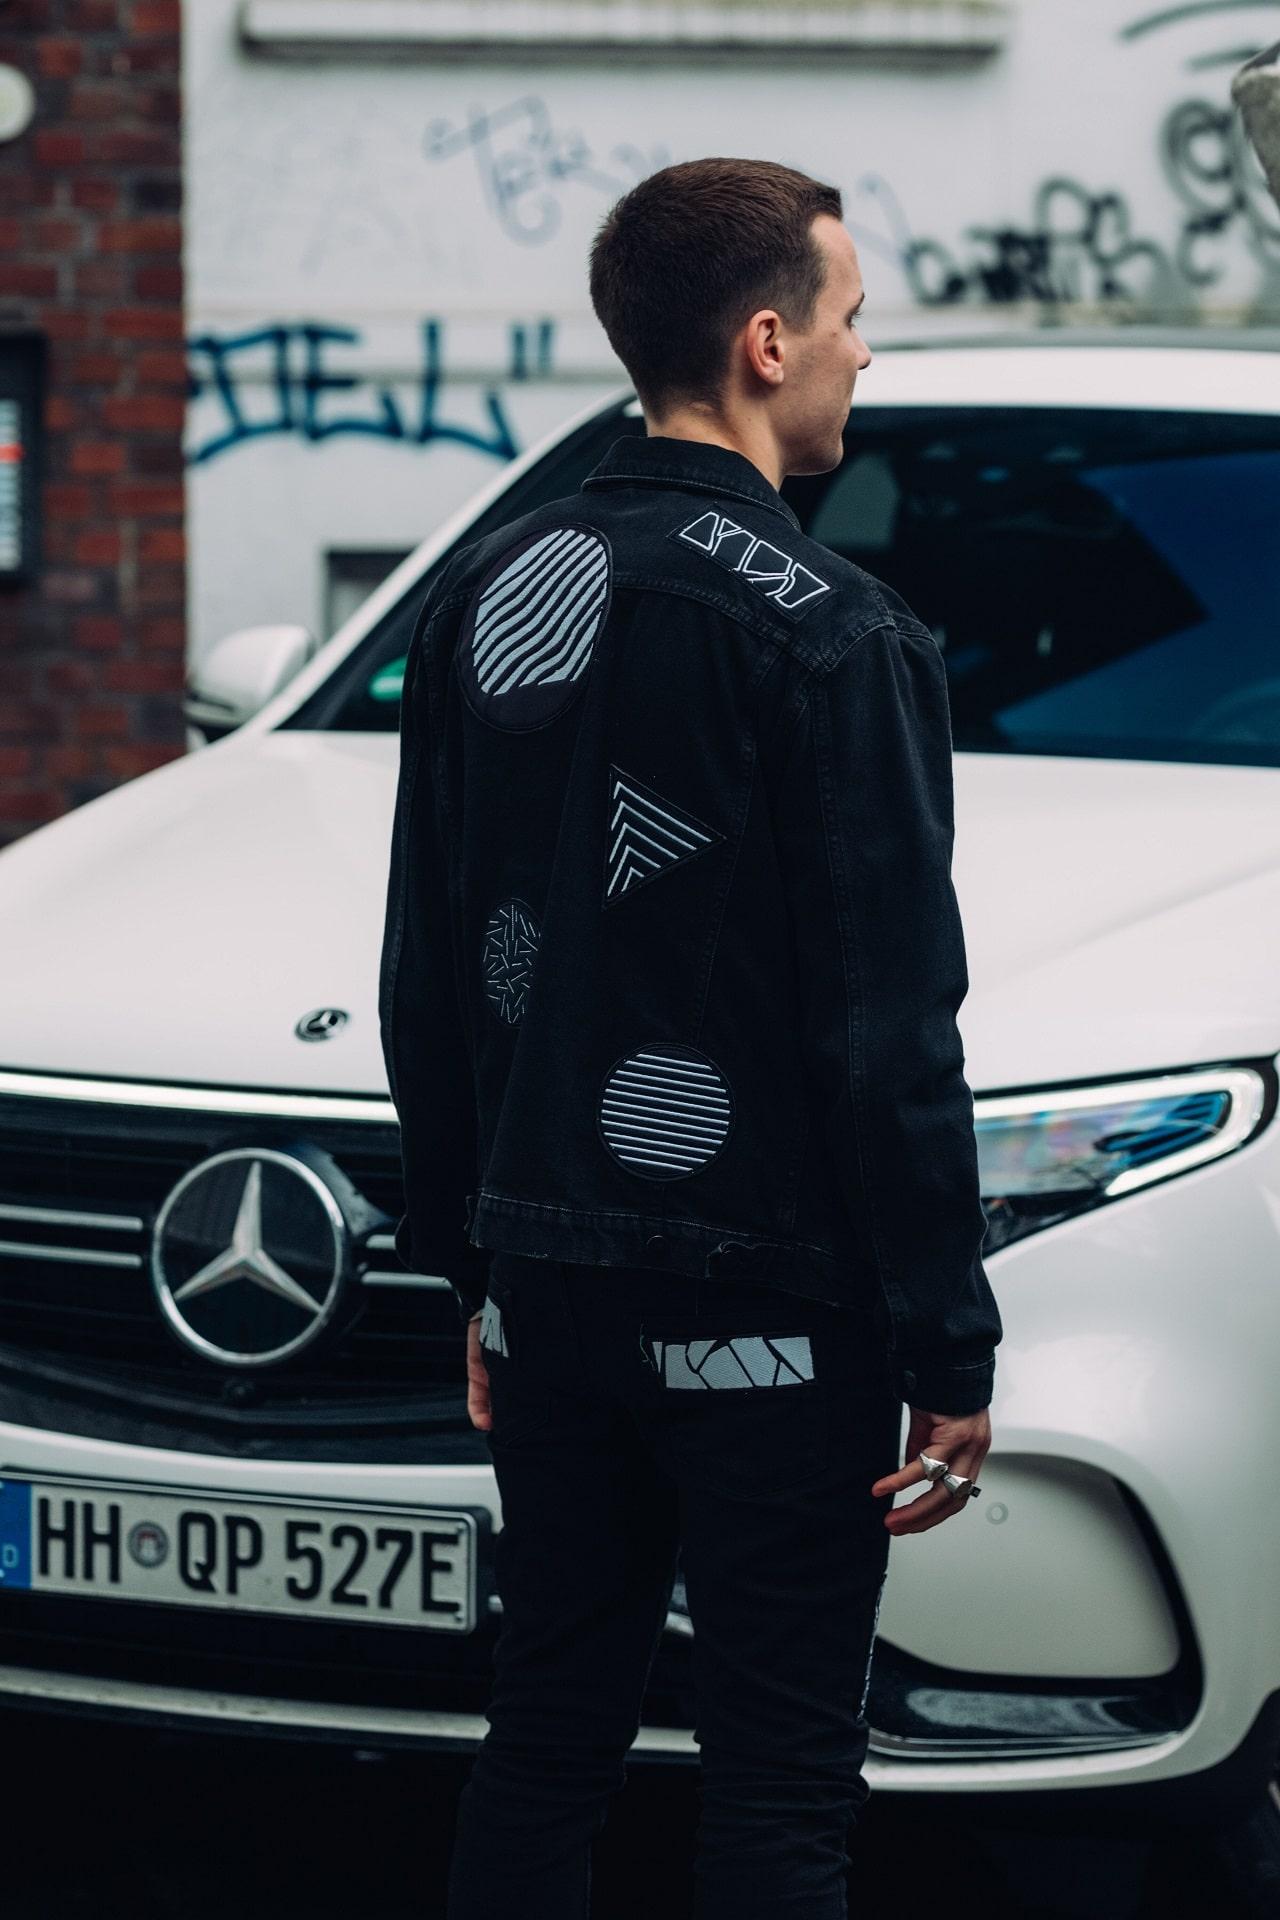 Felix Jaehn, DJ und Mercedes-Benz Markenbotschafter.